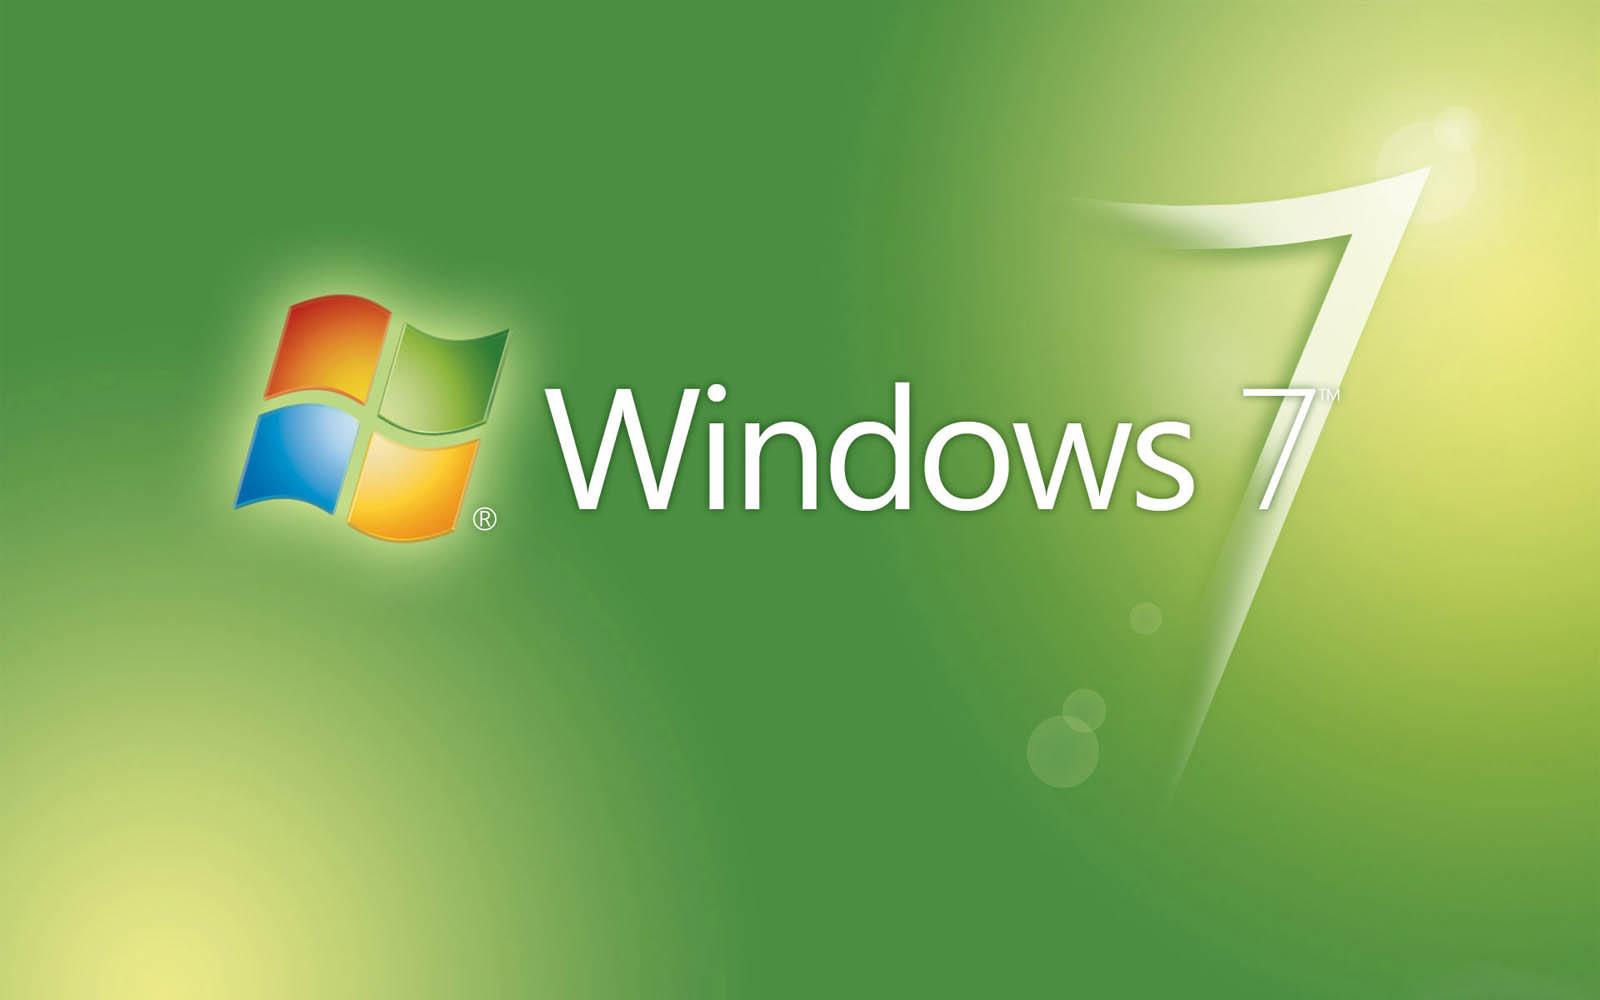 Windows 7 Themes Wallpaper wallpapers: Green Wind...